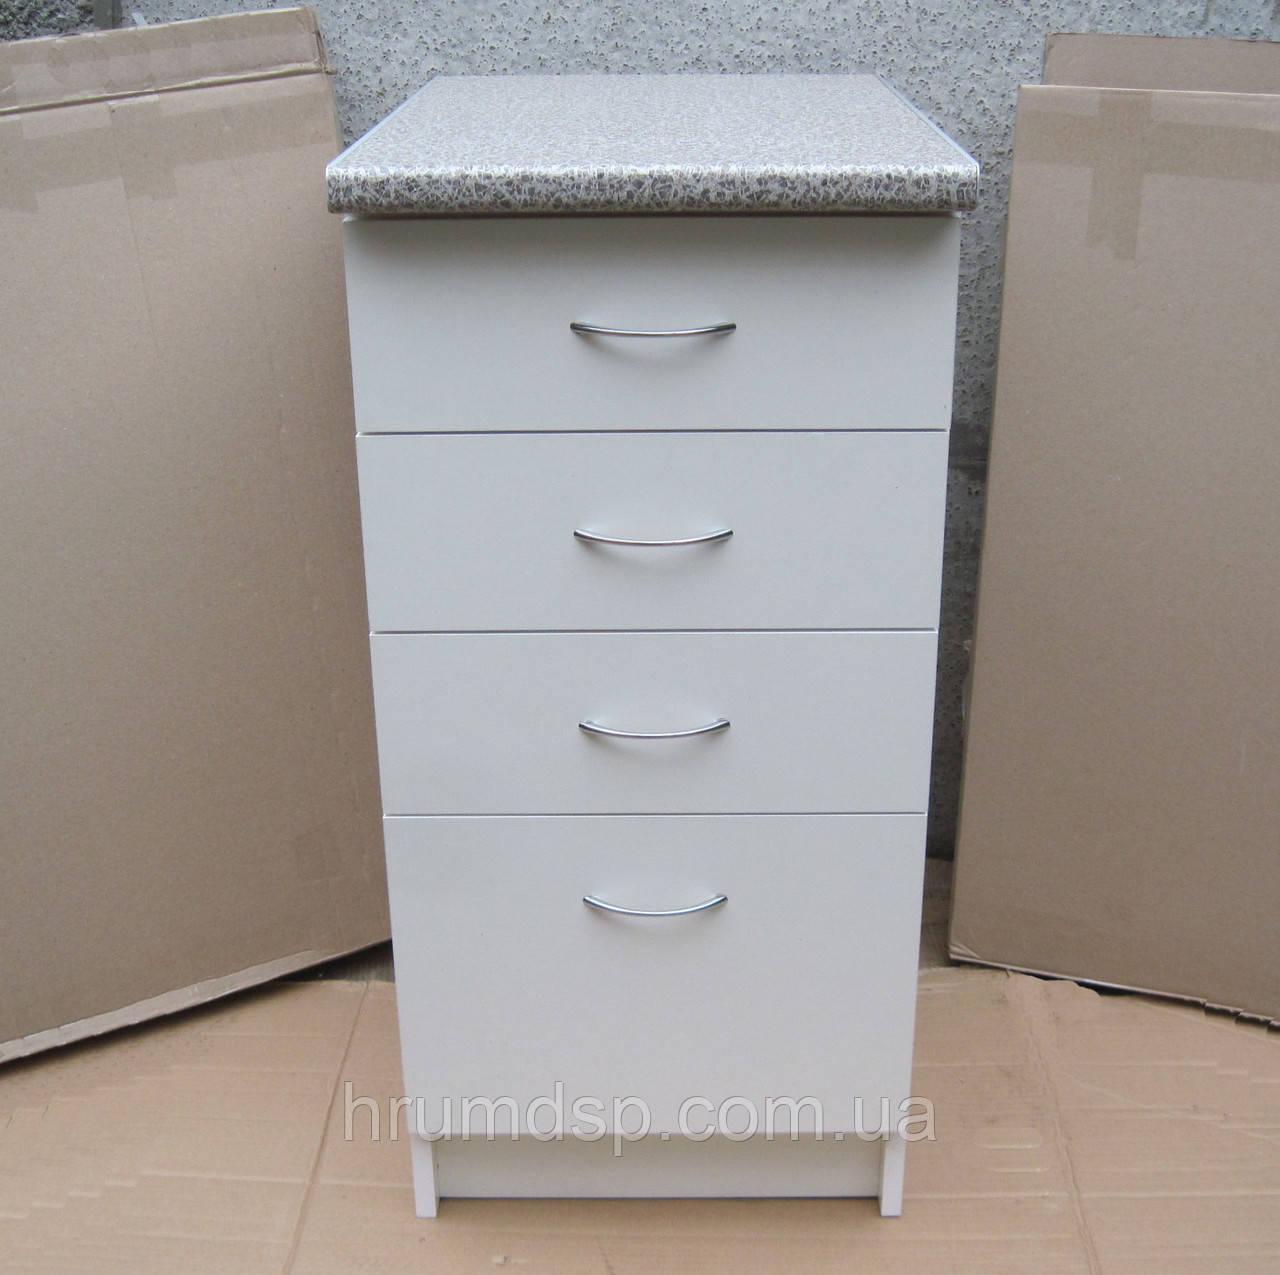 Тумба четыре ящика 40х60 (белая)